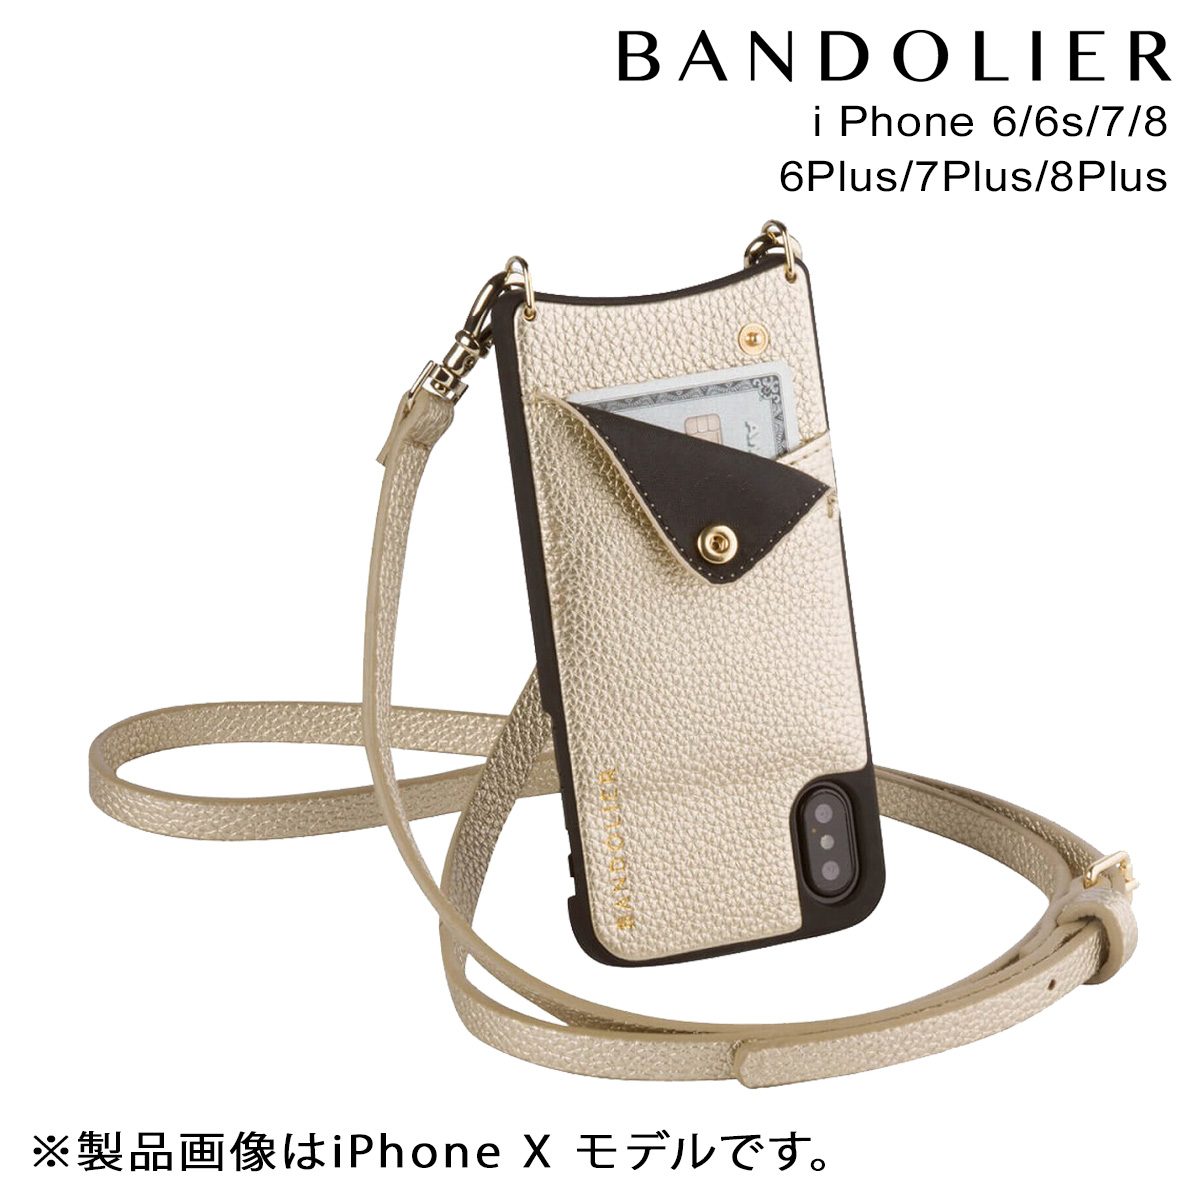 BANDOLIER バンドリヤー iPhone8 iPhone7 7Plus 6s ケース スマホ アイフォン プラス EMMA RICH GOLD メンズ レディース [10/24 新入荷]